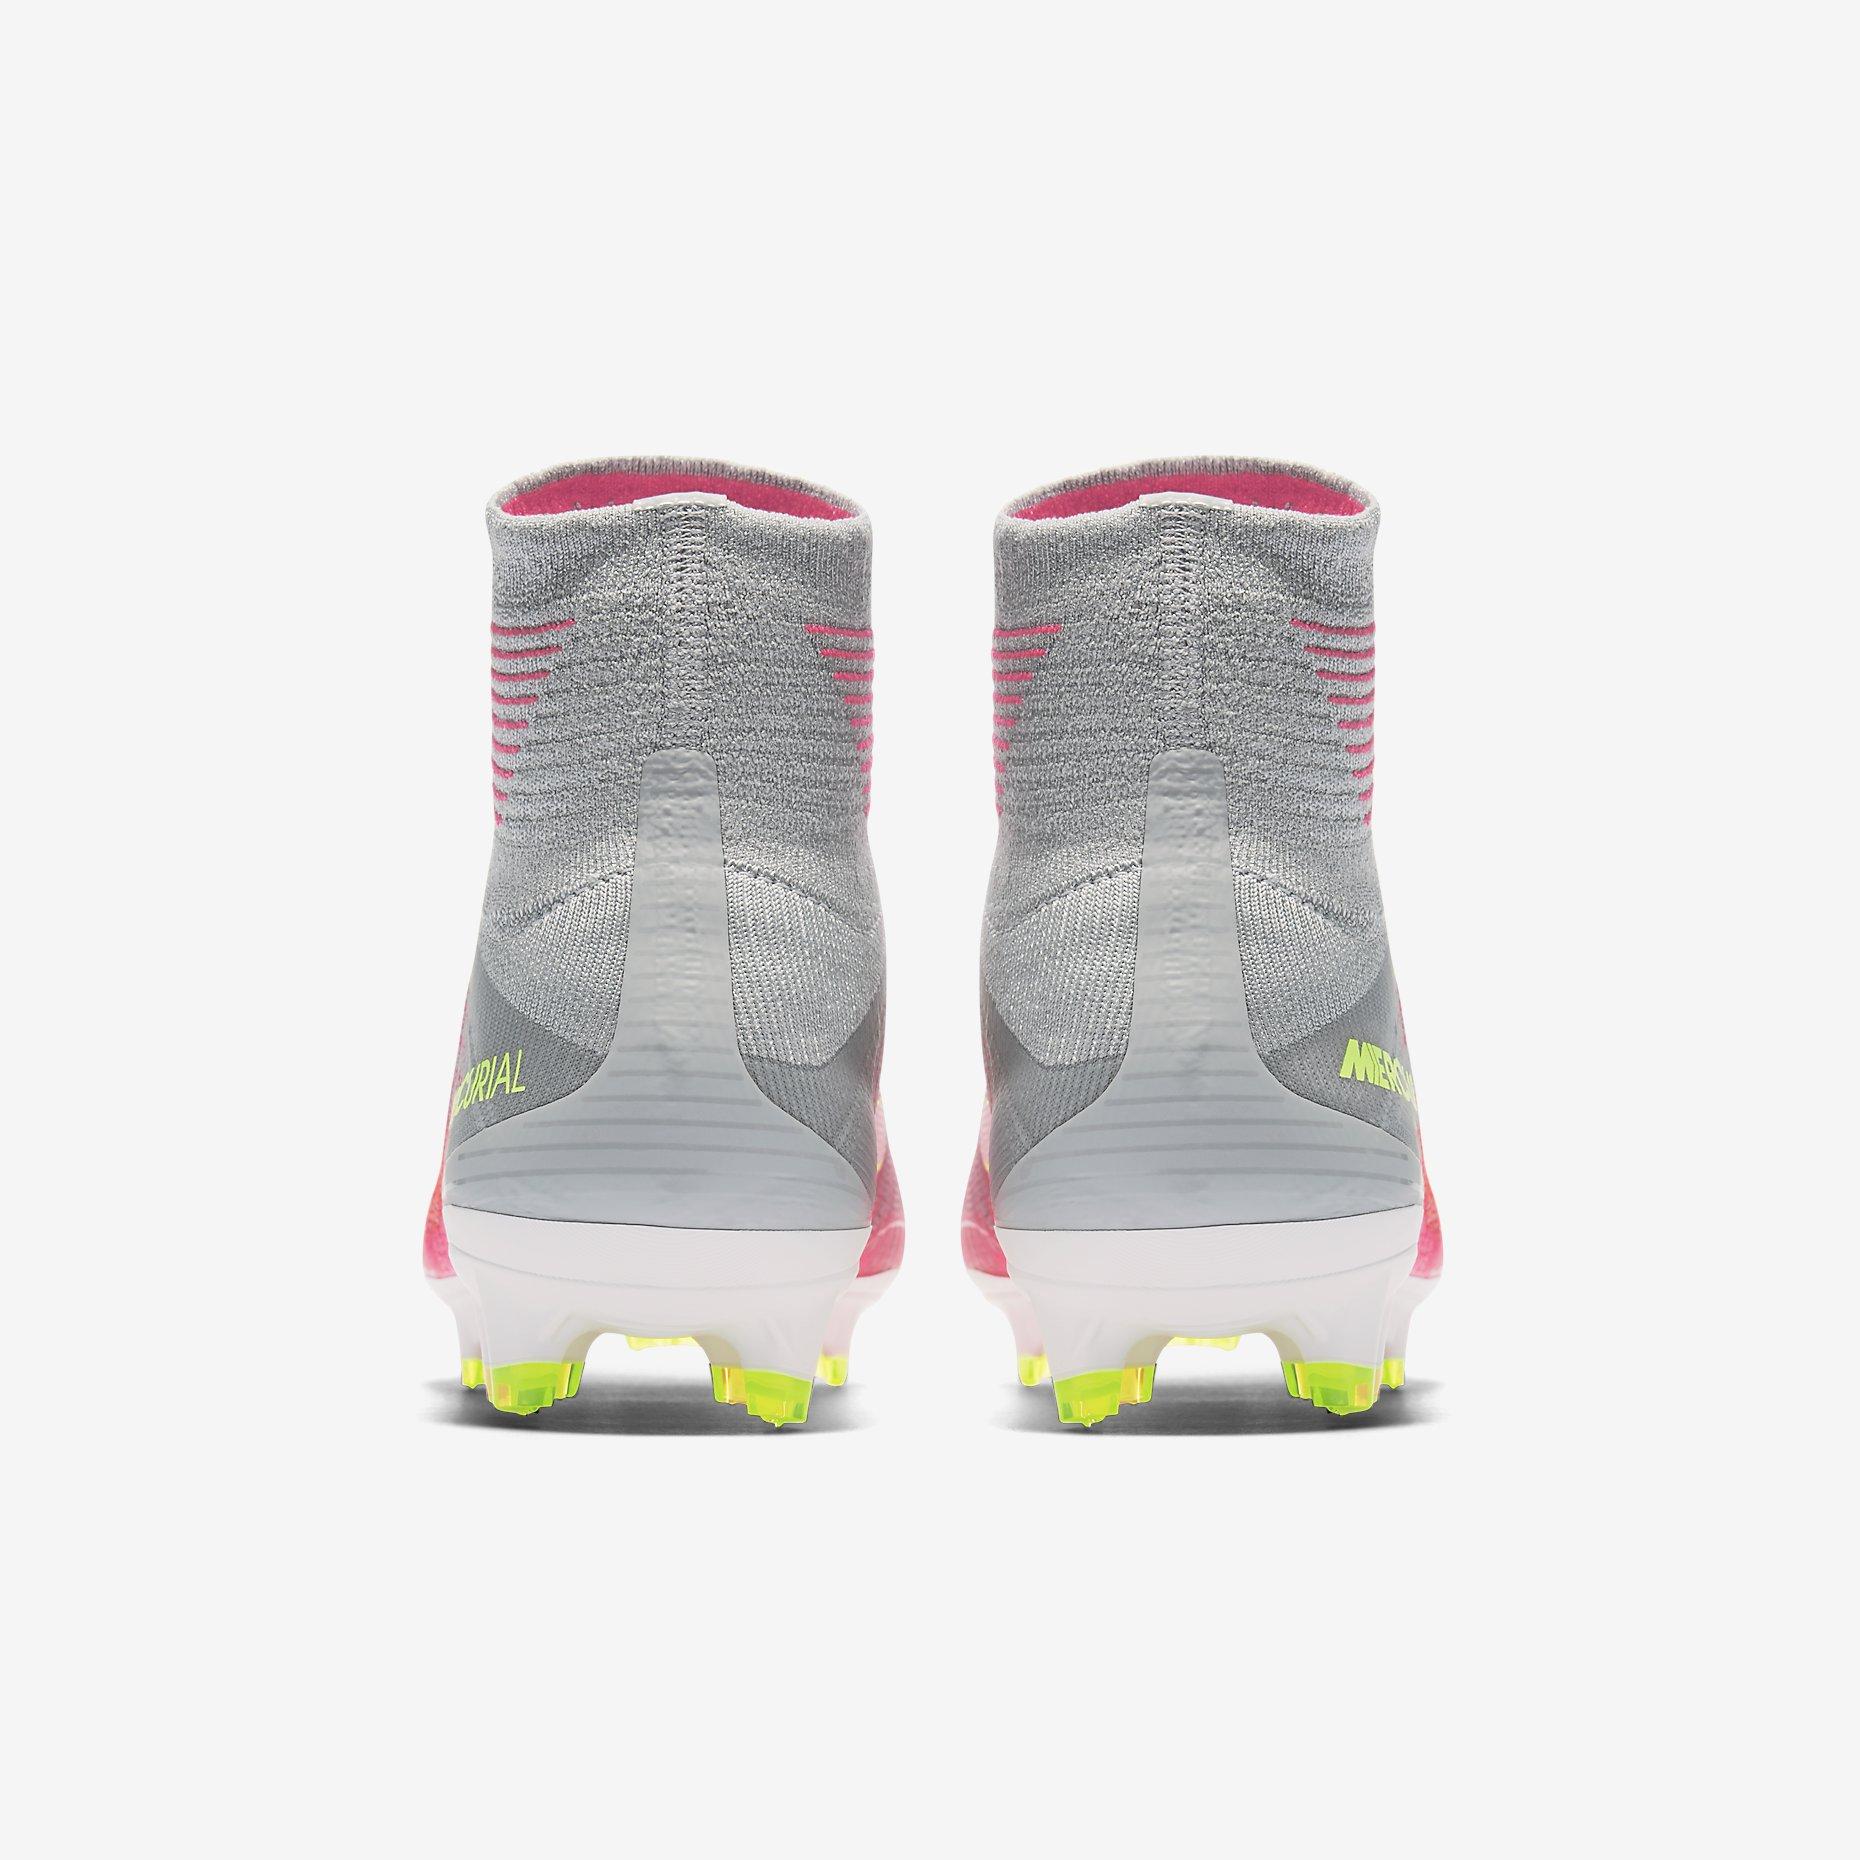 low priced c5c7f b7f50 Nike Mercurial Superfly V Women's FG Motion Blur - Hyper ...